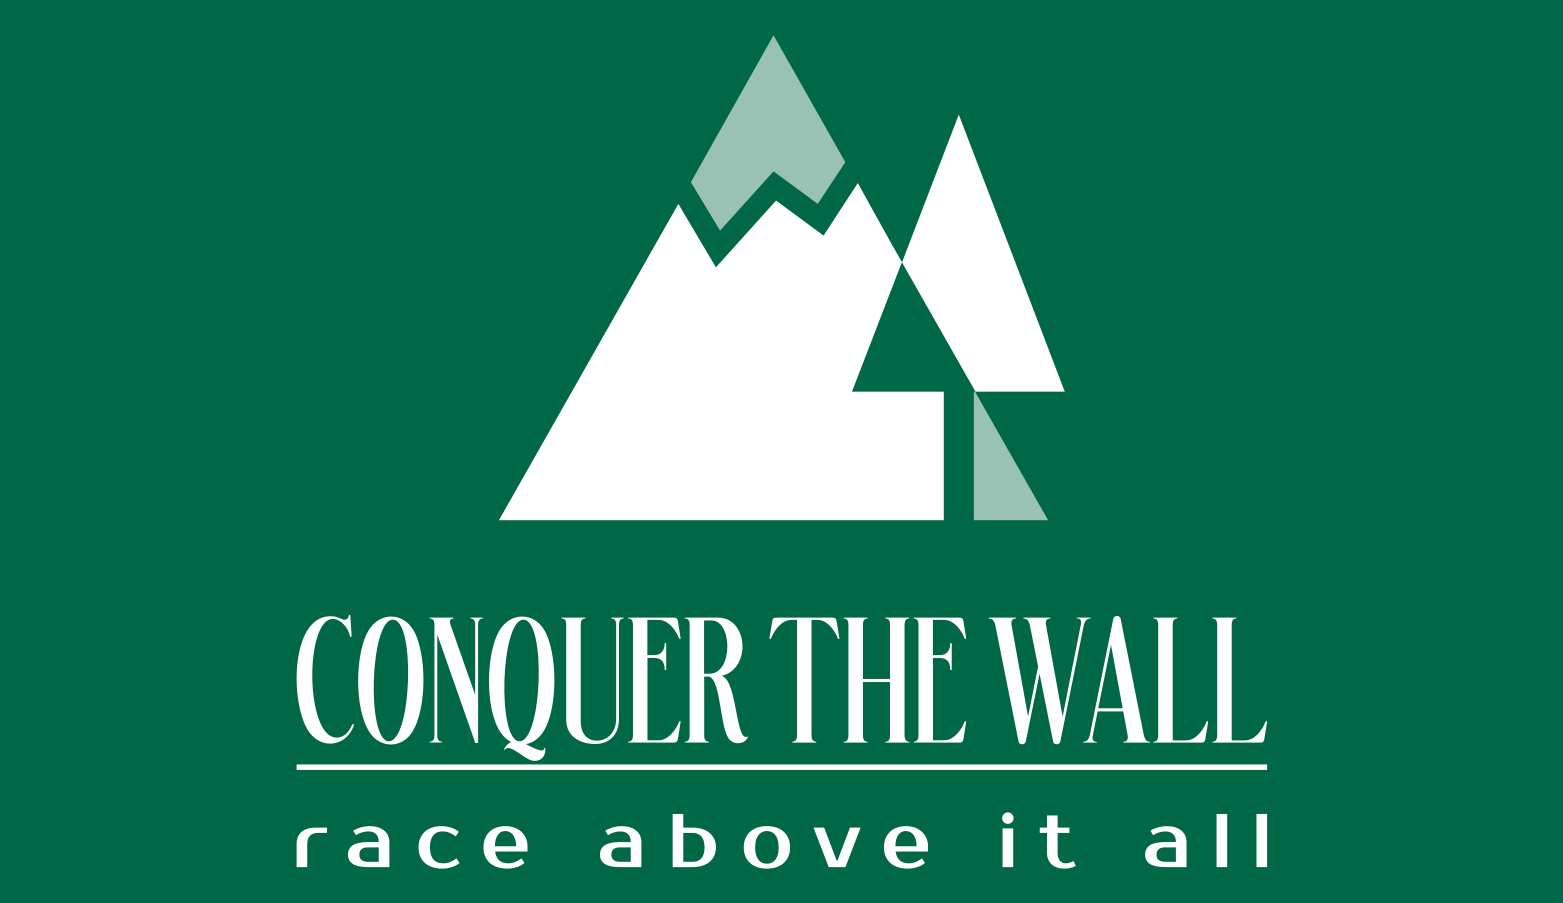 Big Bear Lake 5th Annual Conquer the Wall-August 21st